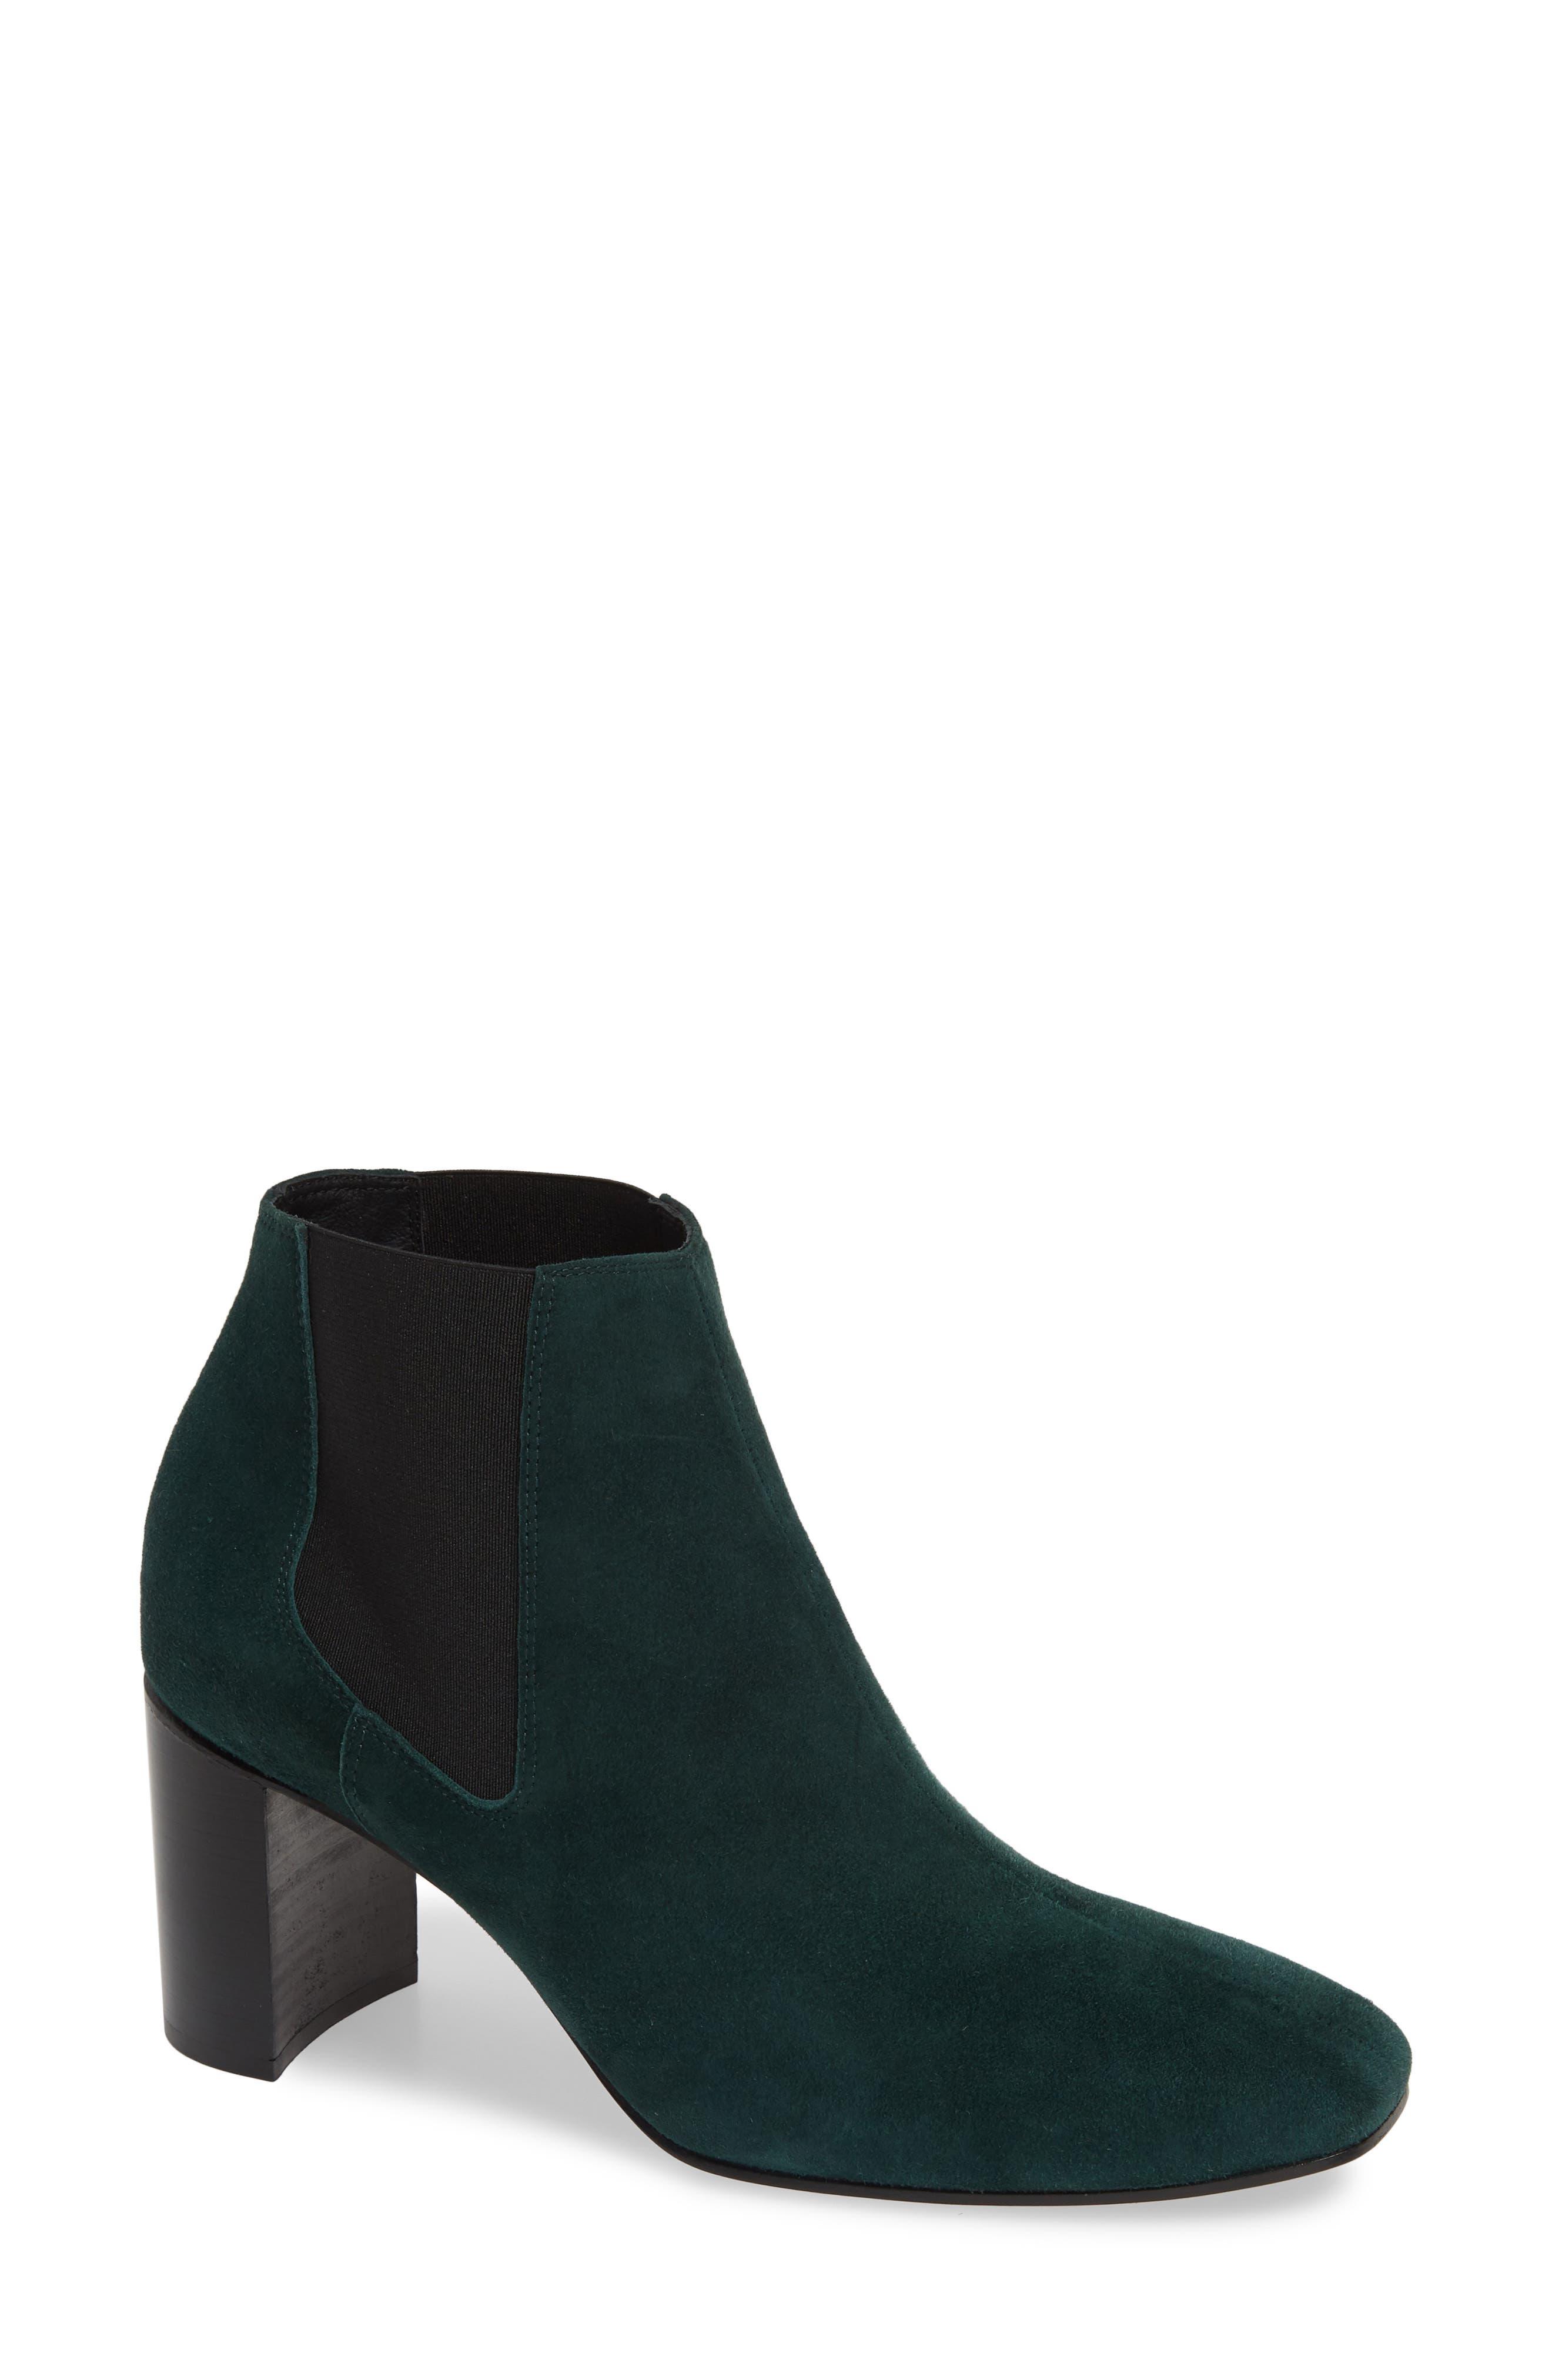 Rag & Bone Asleen Boot - Green